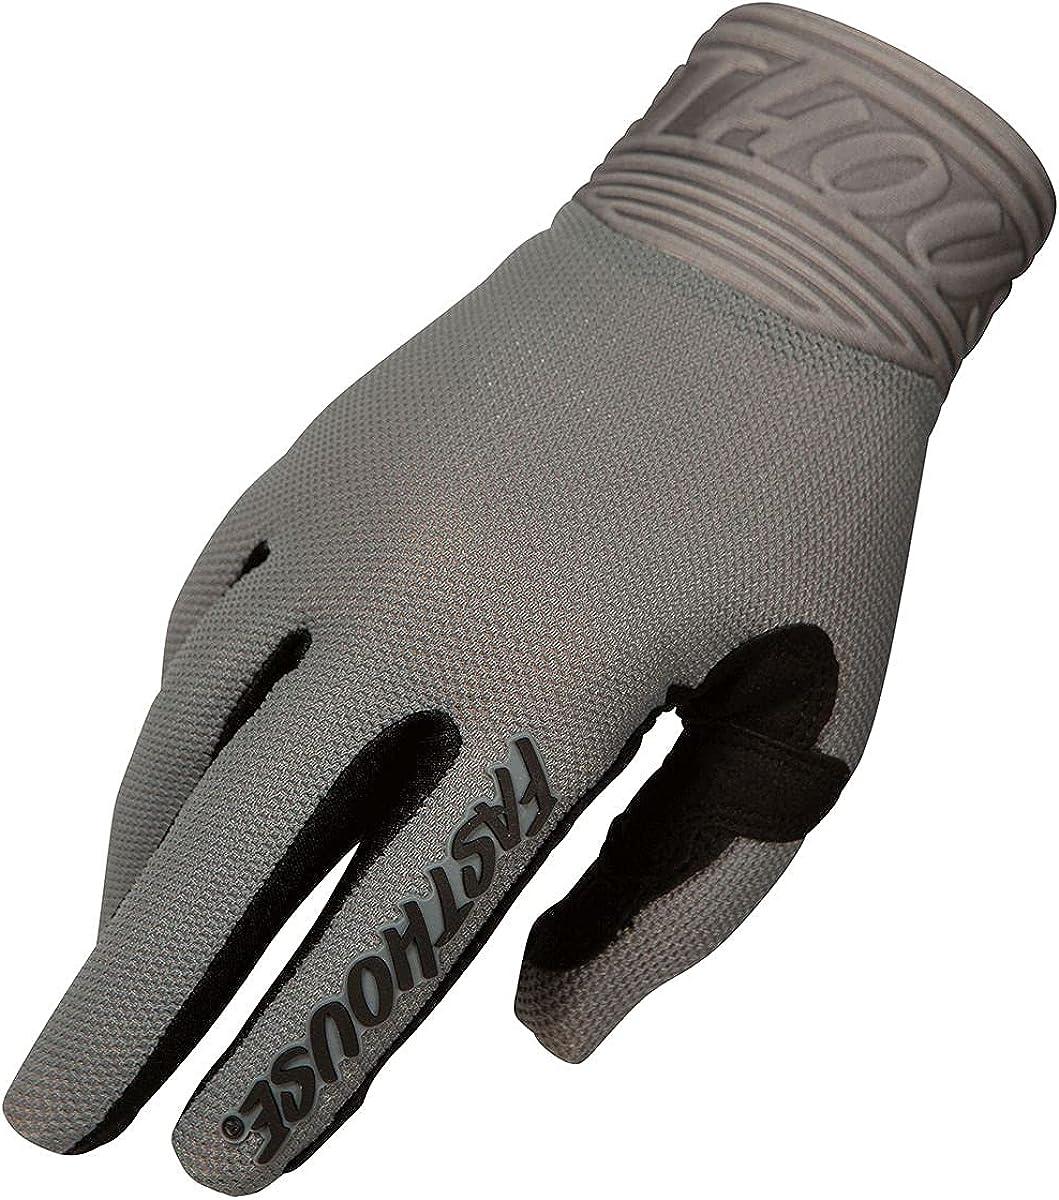 Fasthouse Blitz MX Omaha Mall Indianapolis Mall Glove